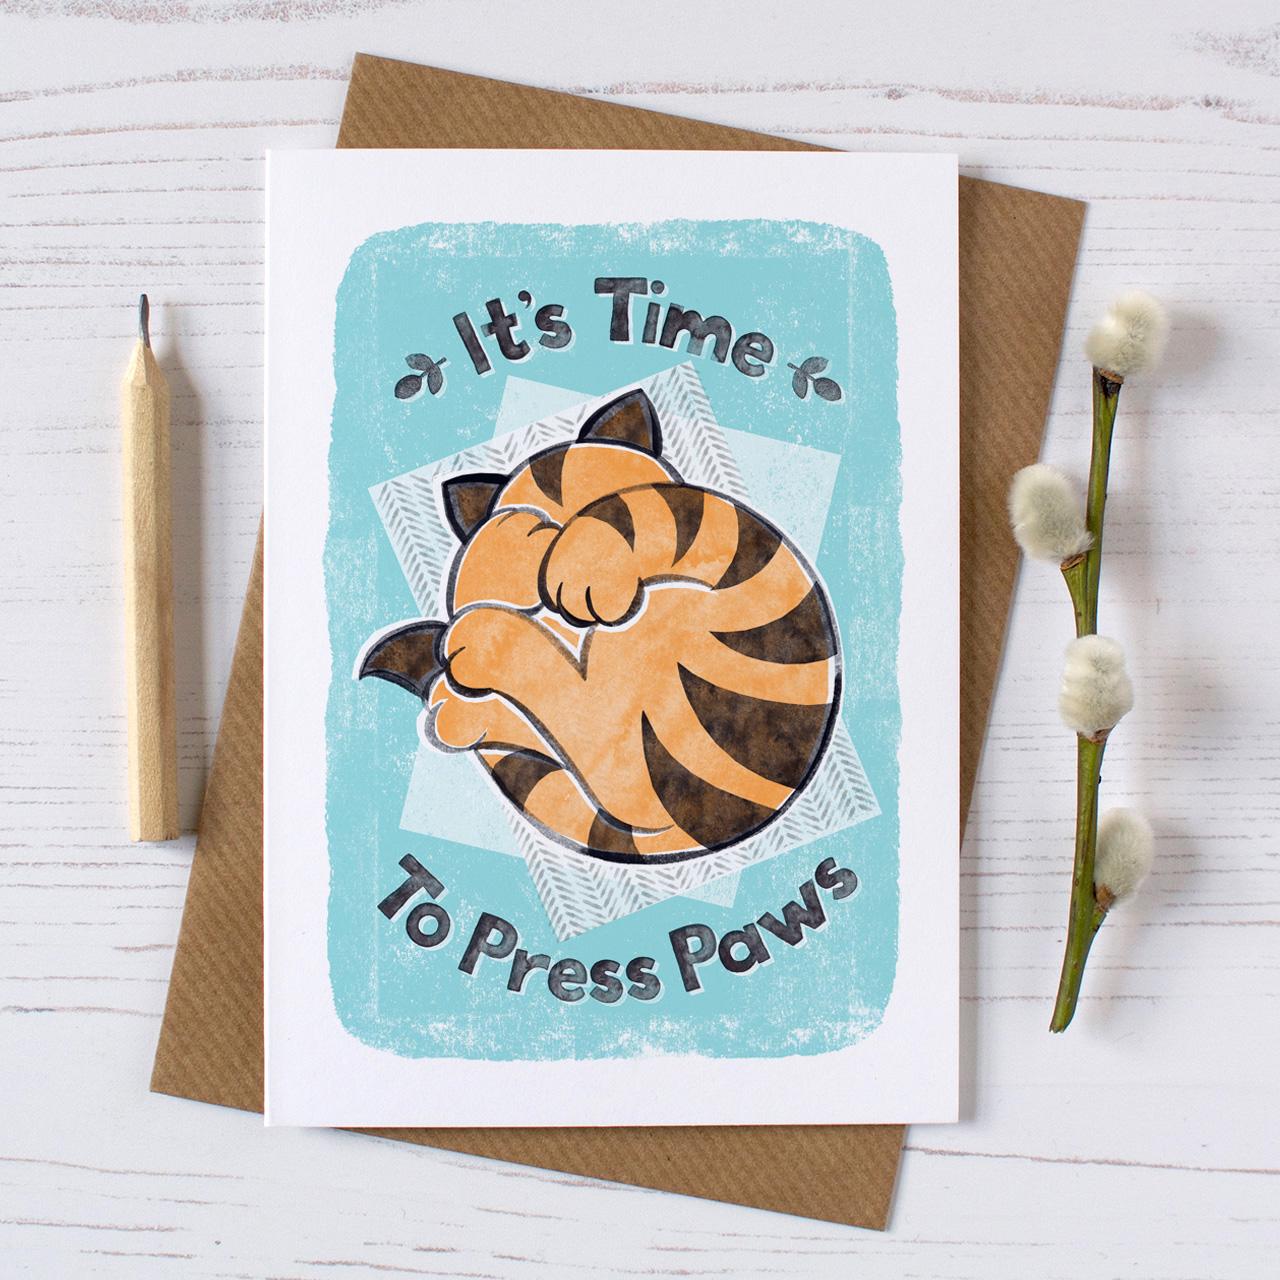 press.paws.card.envelope